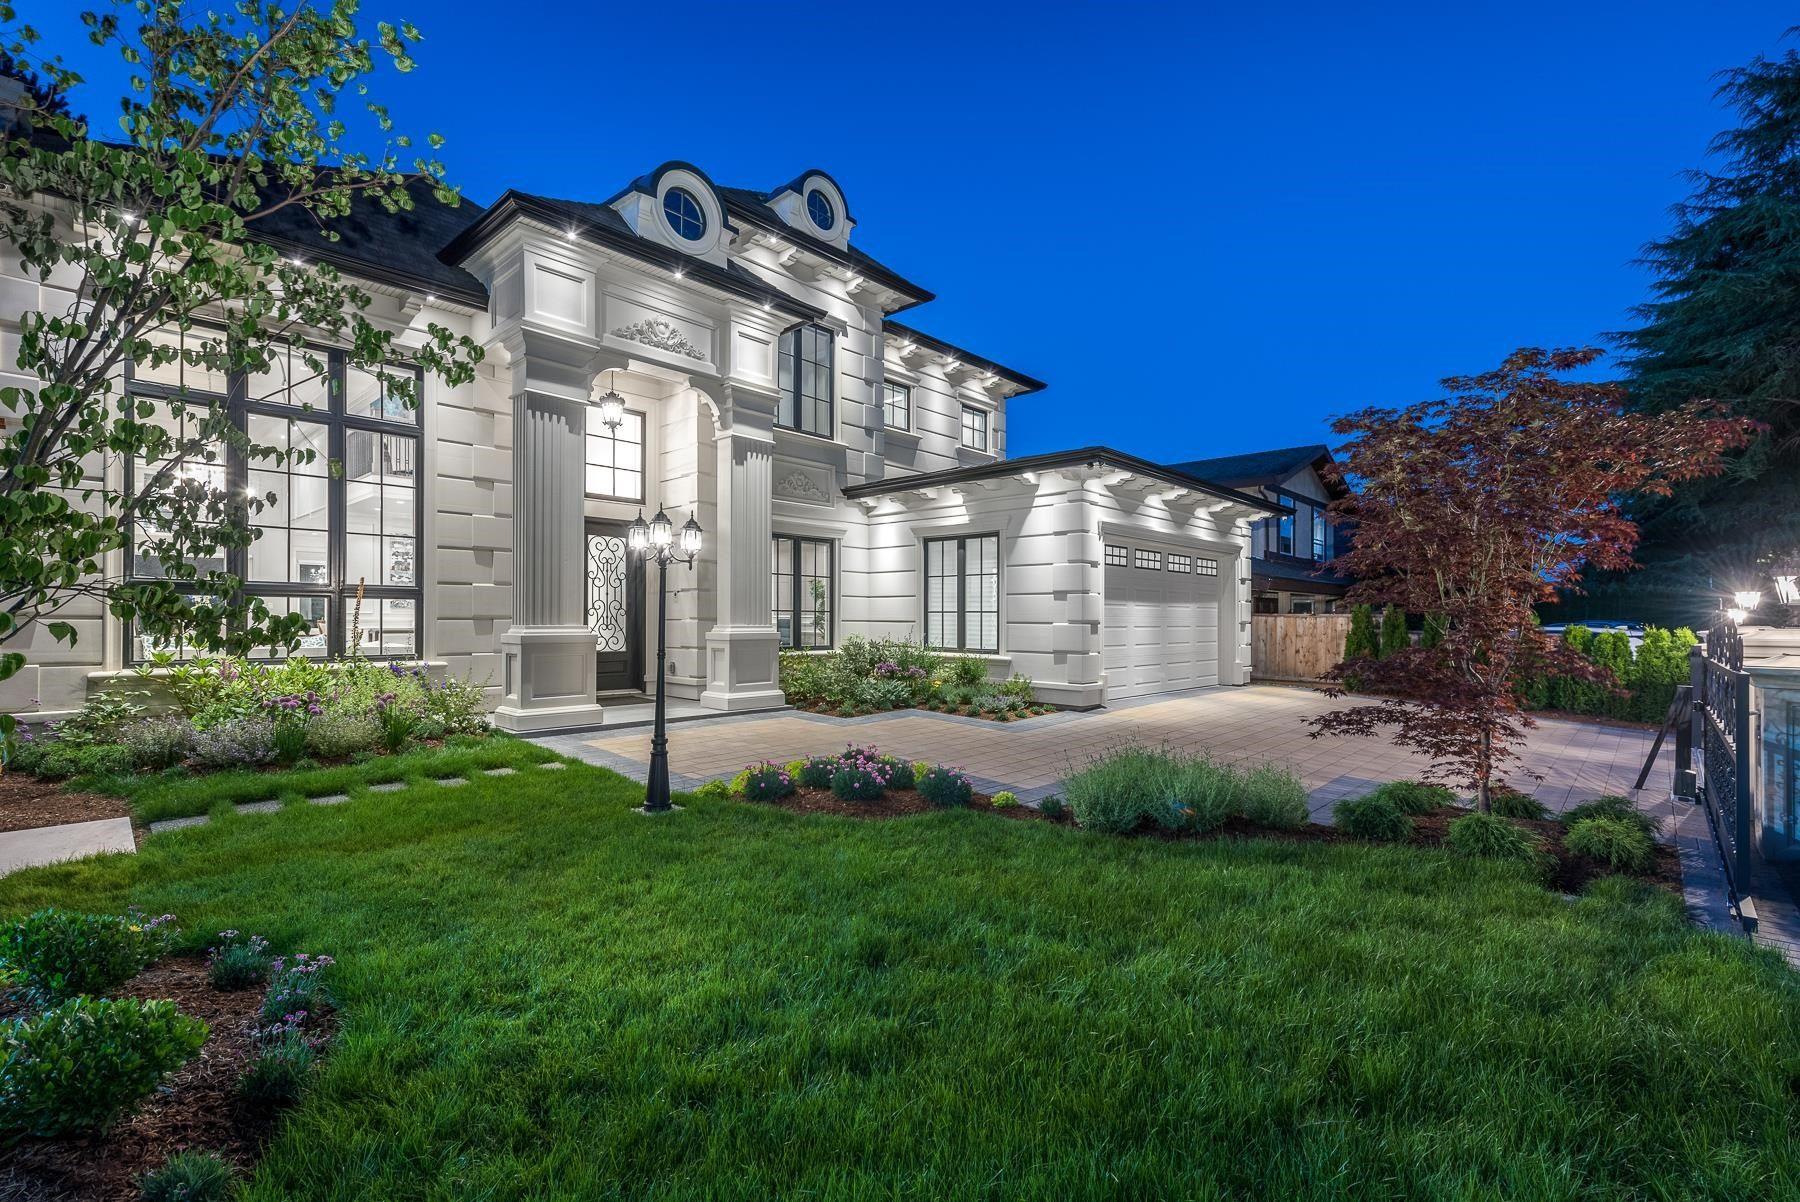 Main Photo: 7431 SCHAEFER Avenue in Richmond: Broadmoor House for sale : MLS®# R2615625